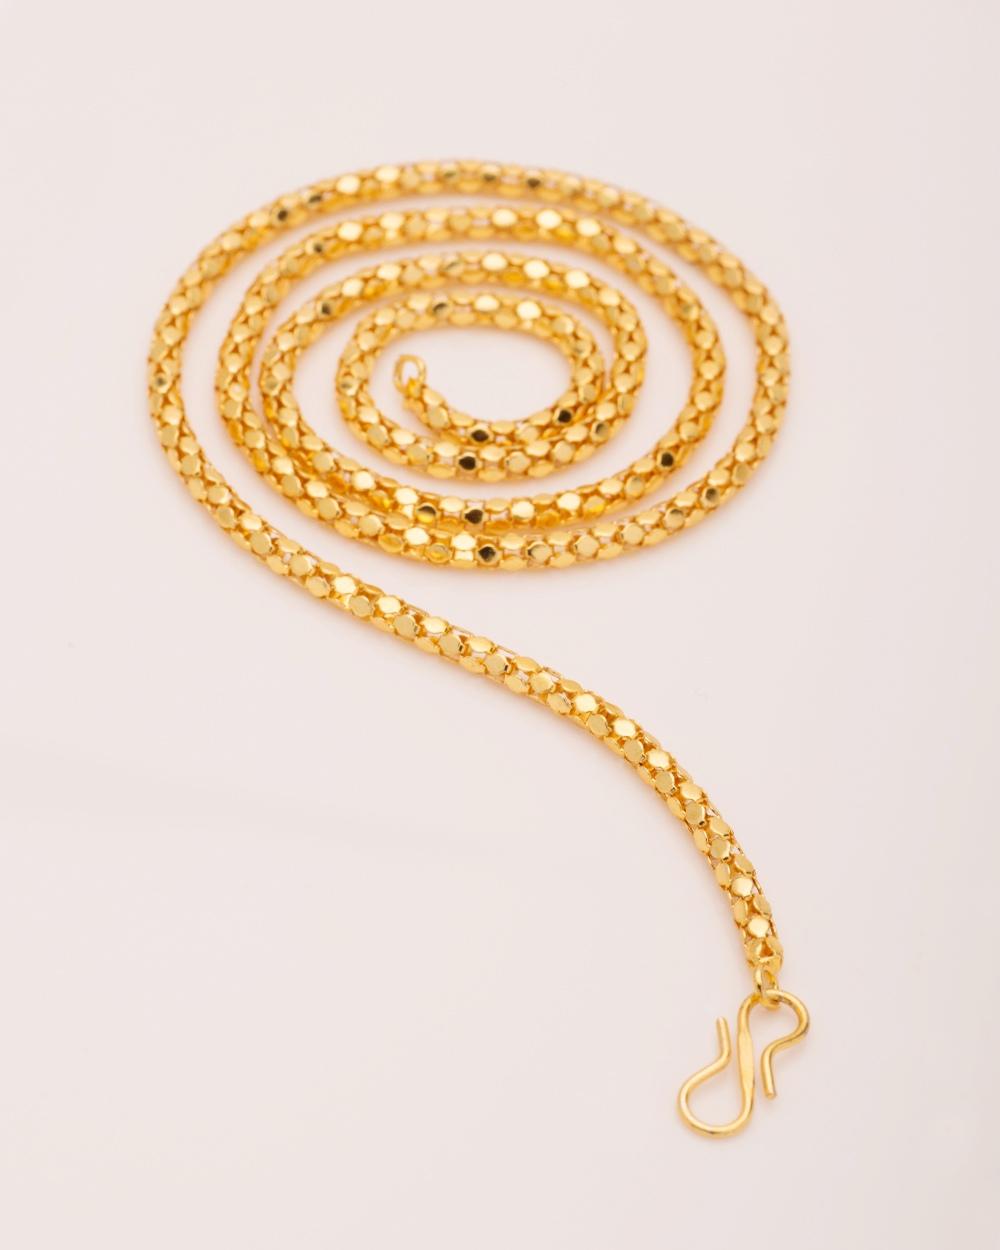 Buy Voylla Women\'s Yellow Gold Chain Online India | Voylla